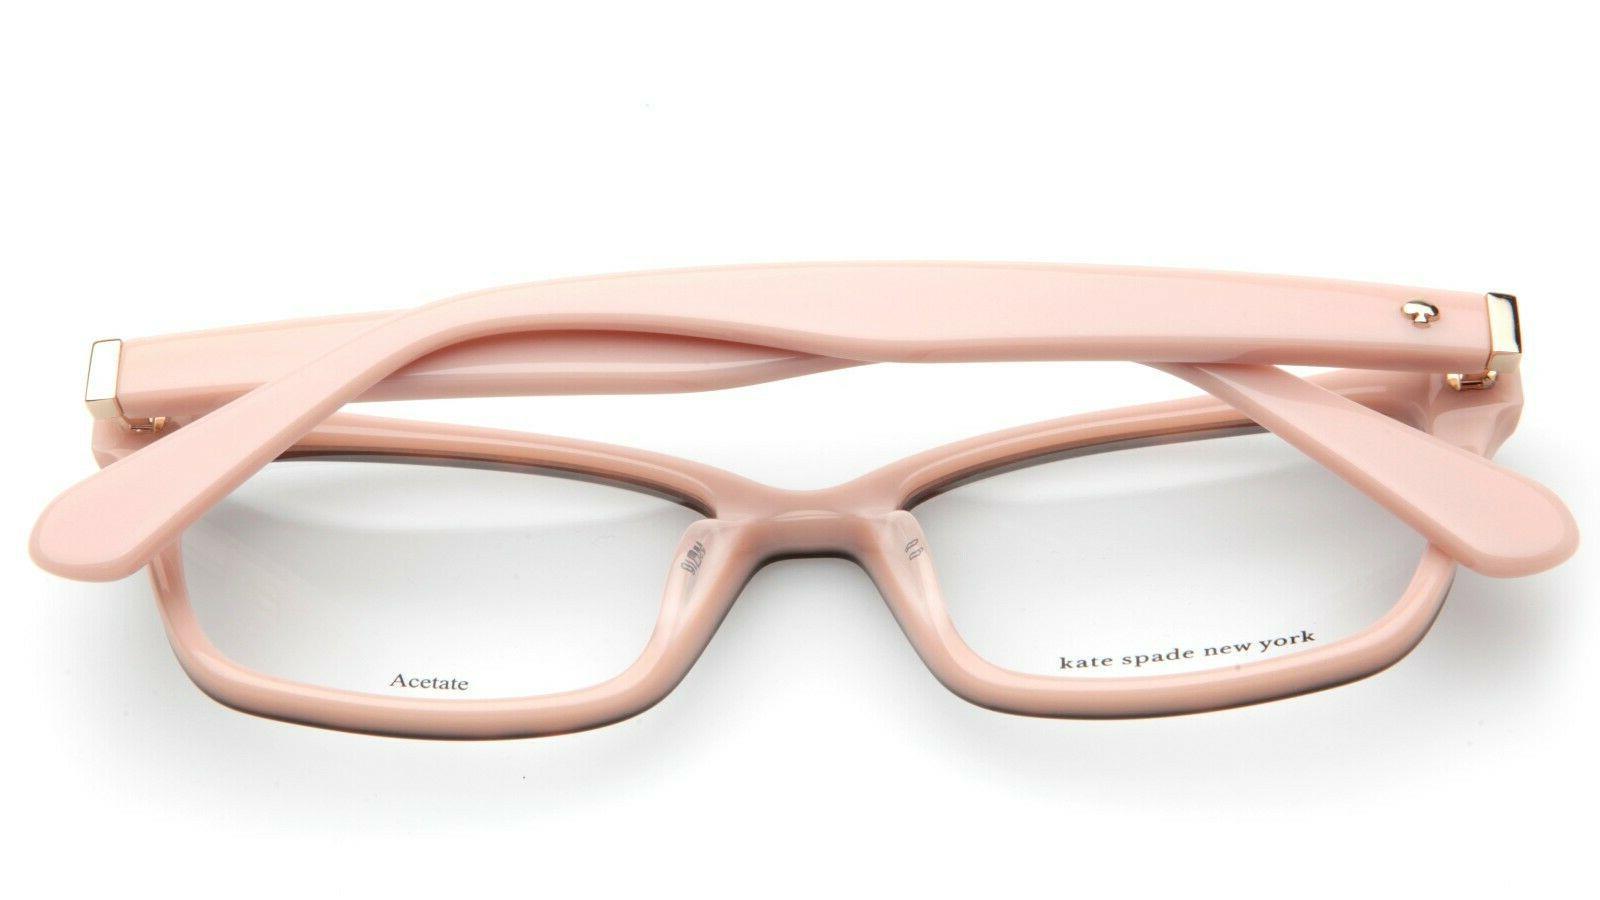 New York / Eyeglasses 52-16-140mm